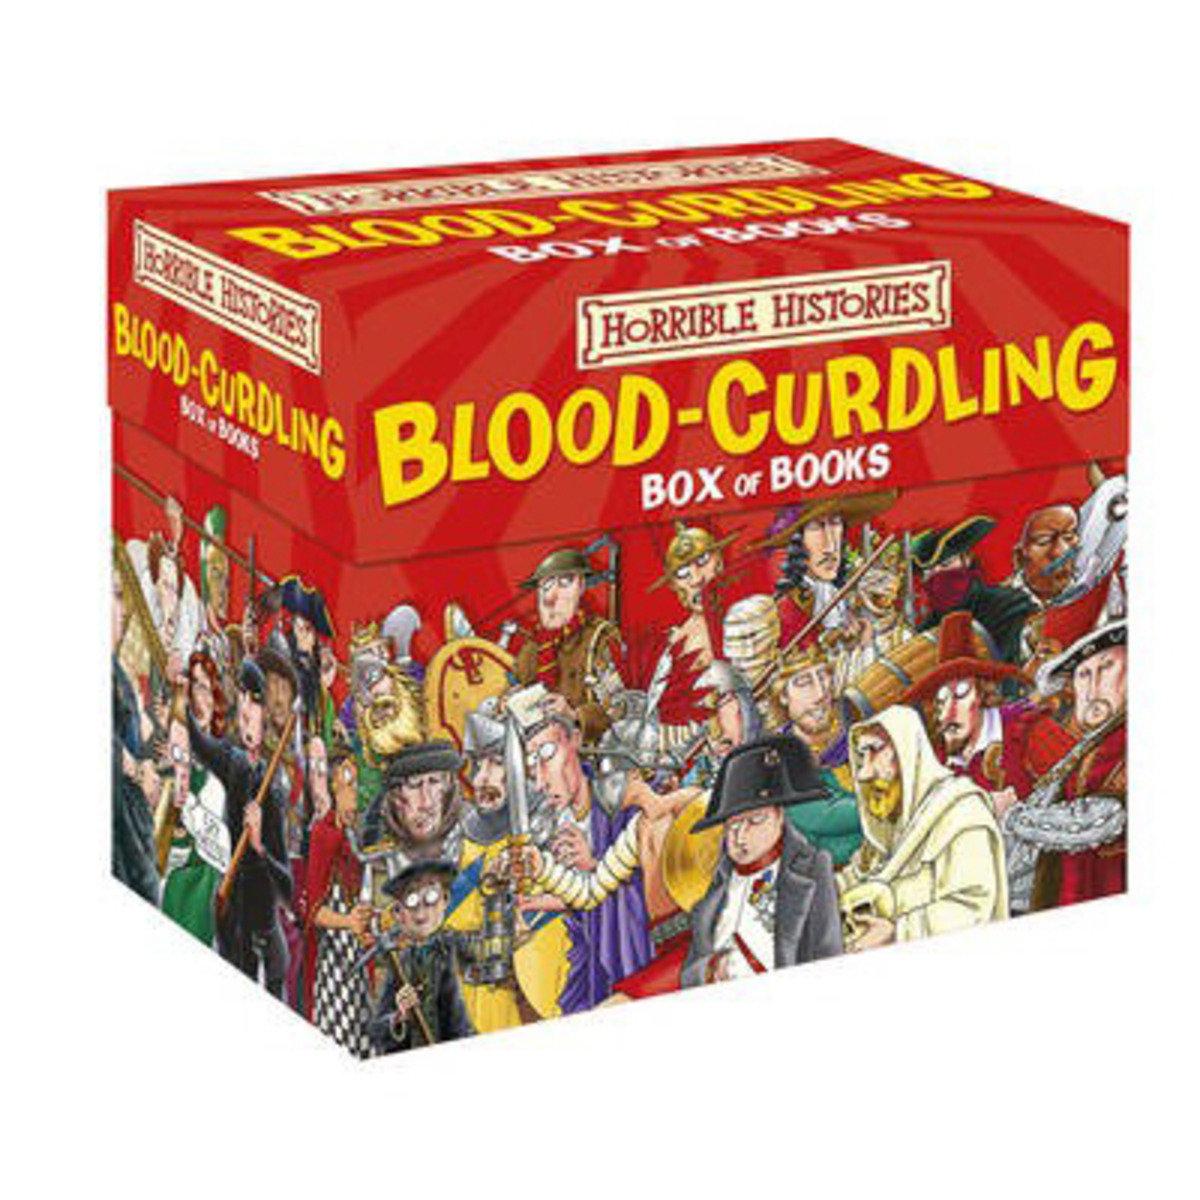 Blood-curdling Box